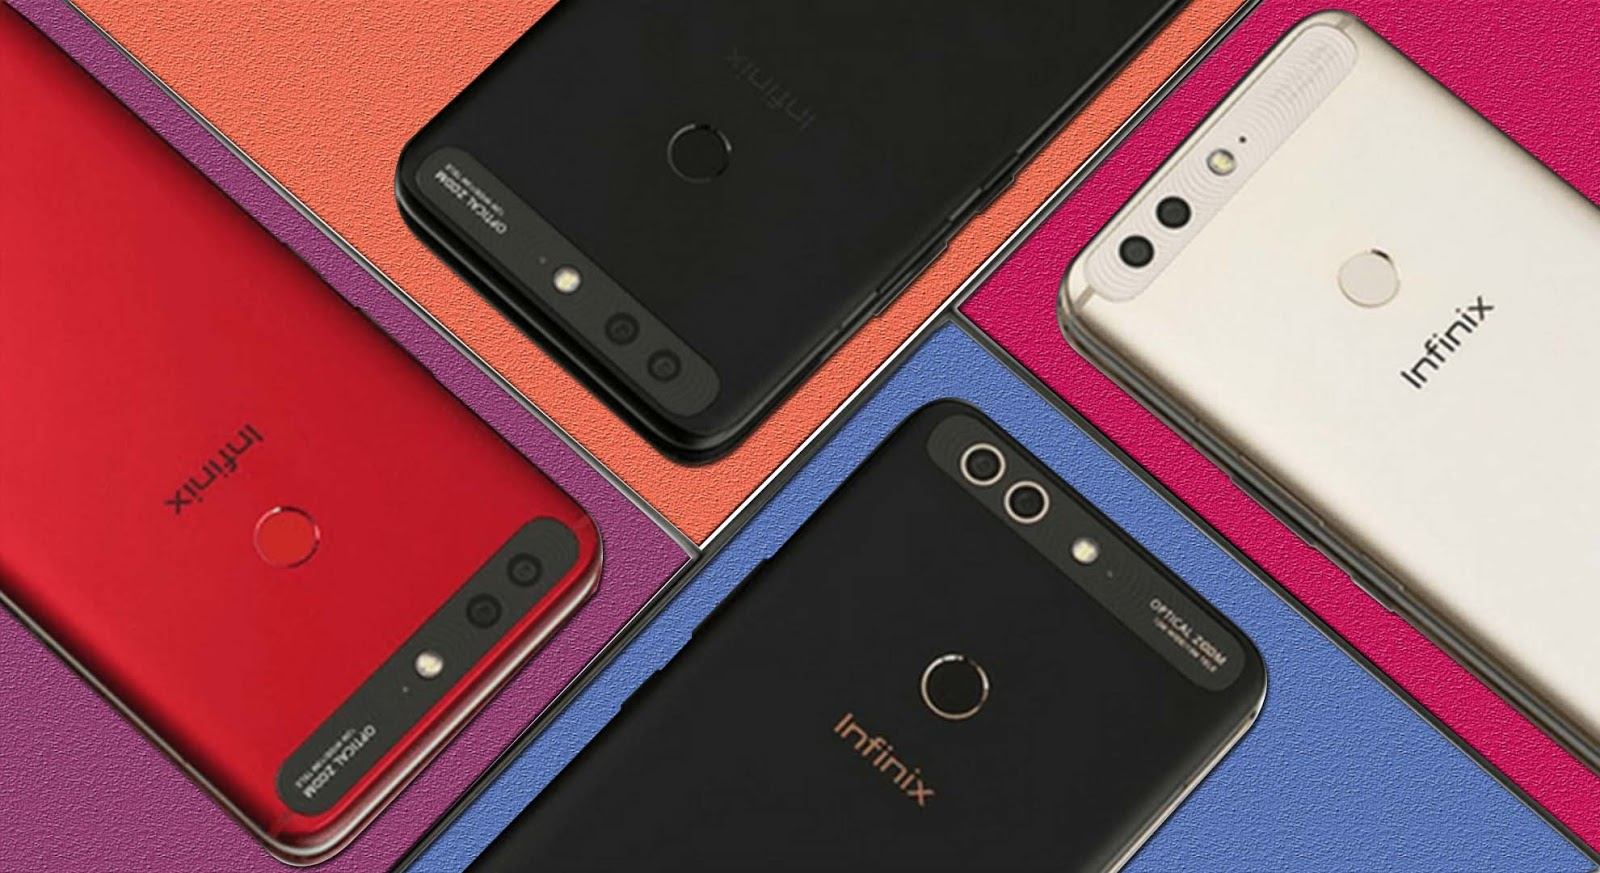 The infinix zero 5's color variations